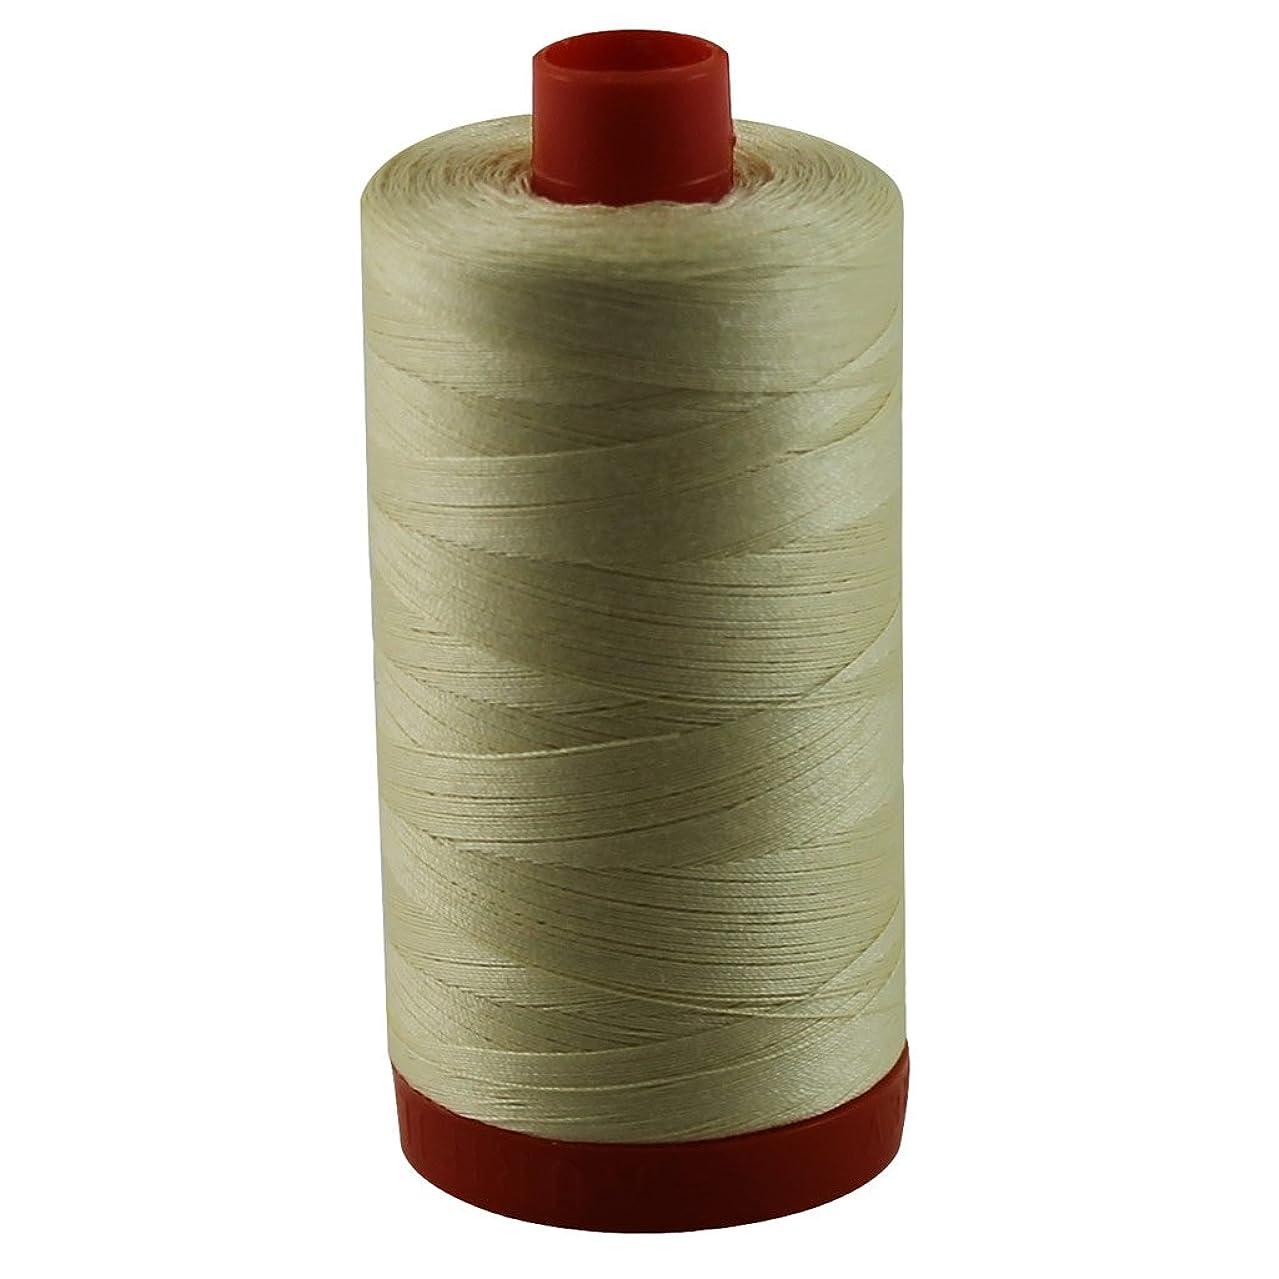 Aurifil 50wt Mako Cotton Thread 1,422 yards - Light Lemon A1050-2110